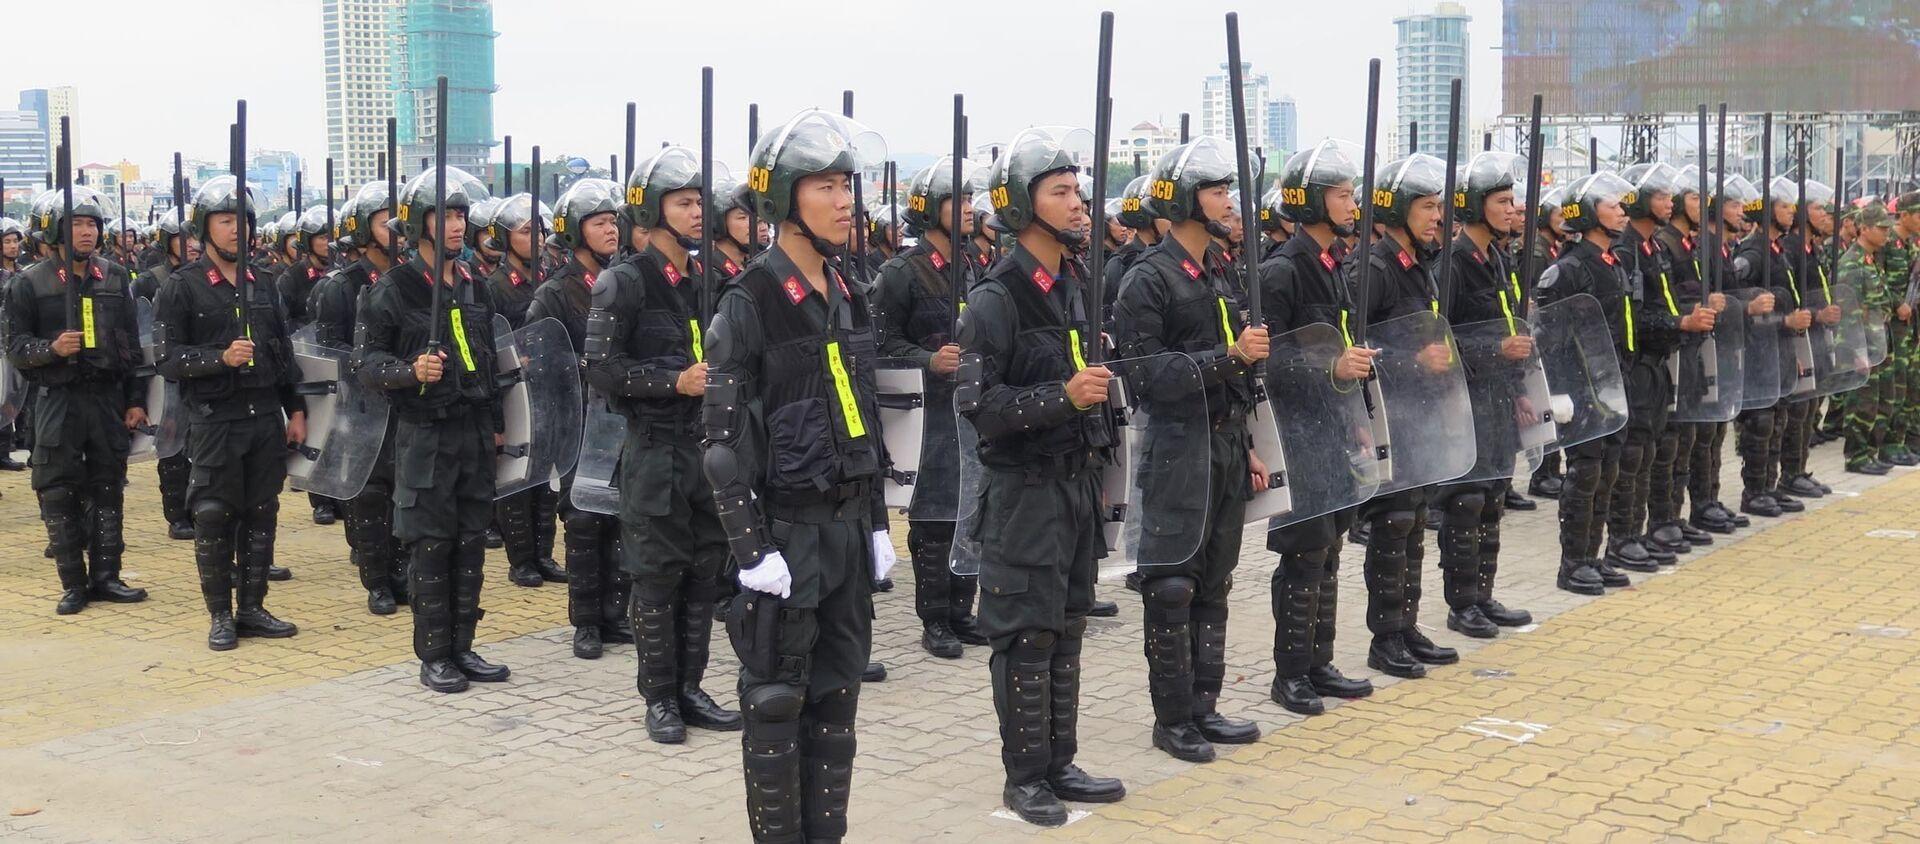 Вьетнам атэс саммит полиция подготовка полицейский - Sputnik Việt Nam, 1920, 08.12.2017